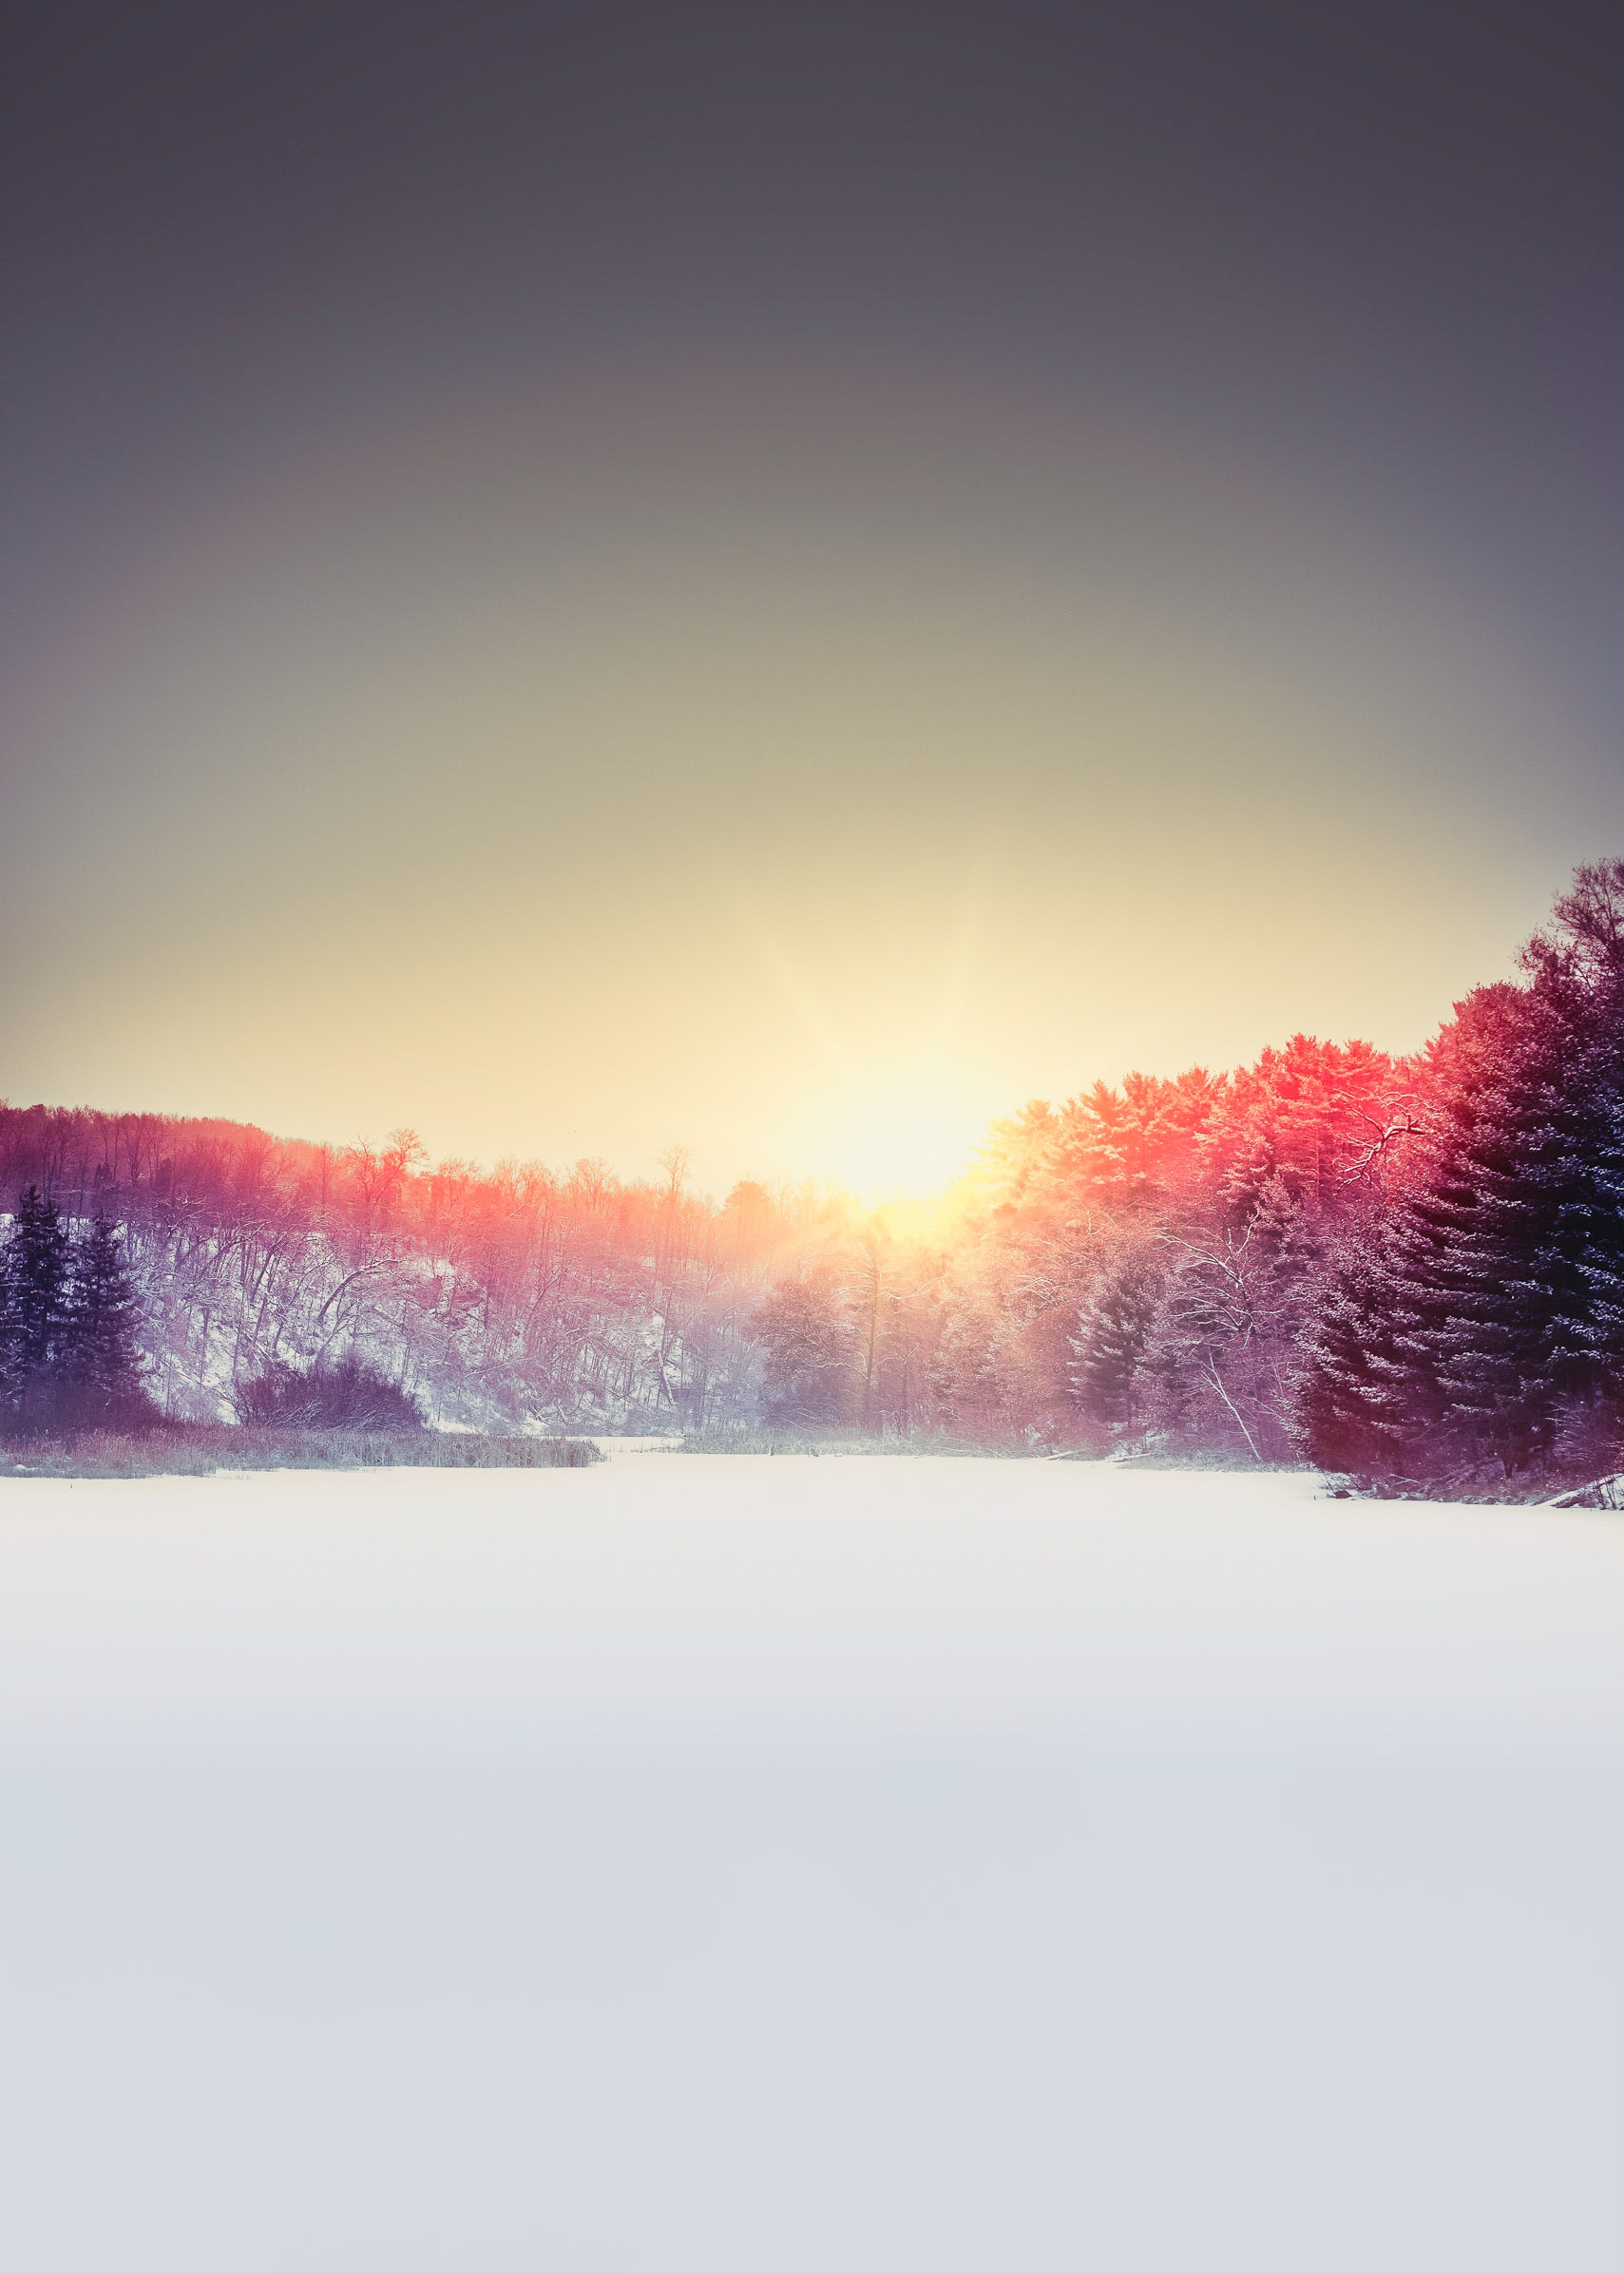 Iphoneの壁紙 冬 凍るの無料の写真素材